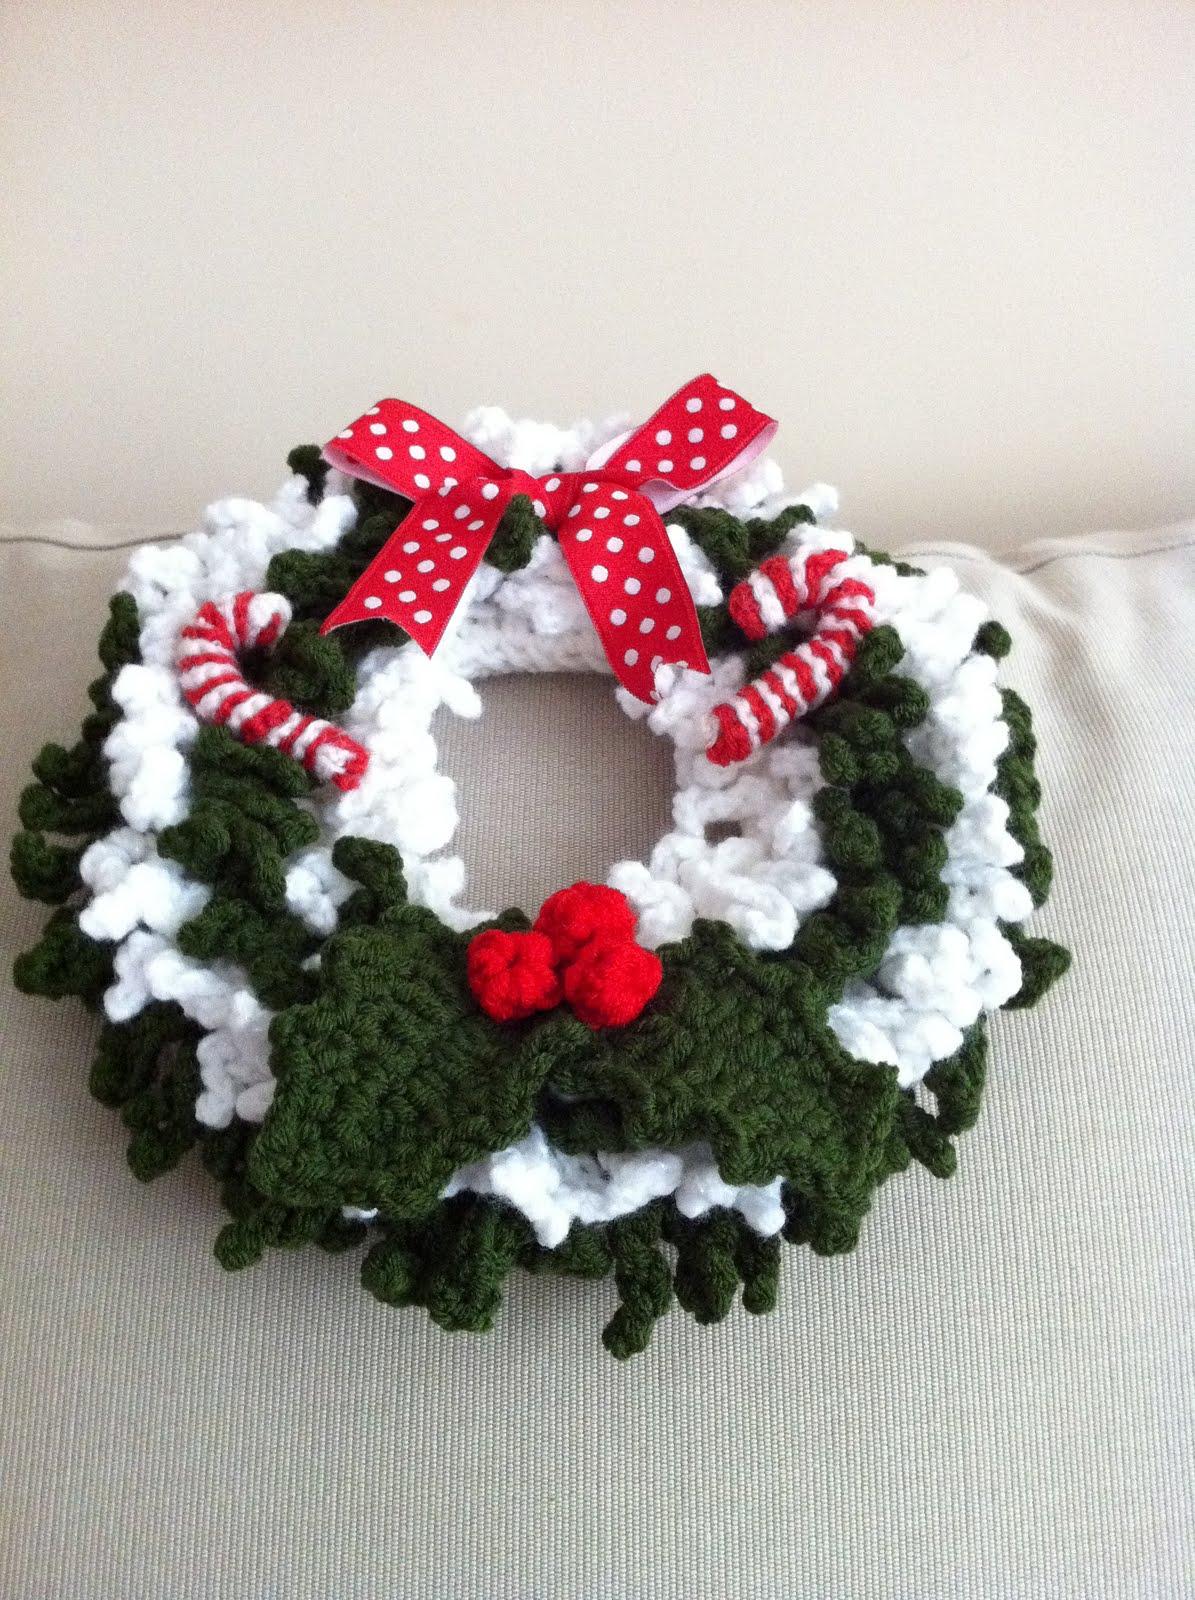 Crochet Pattern For Xmas Wreath : Handmade with love by G.: Crochet Christmas Wreath 2011